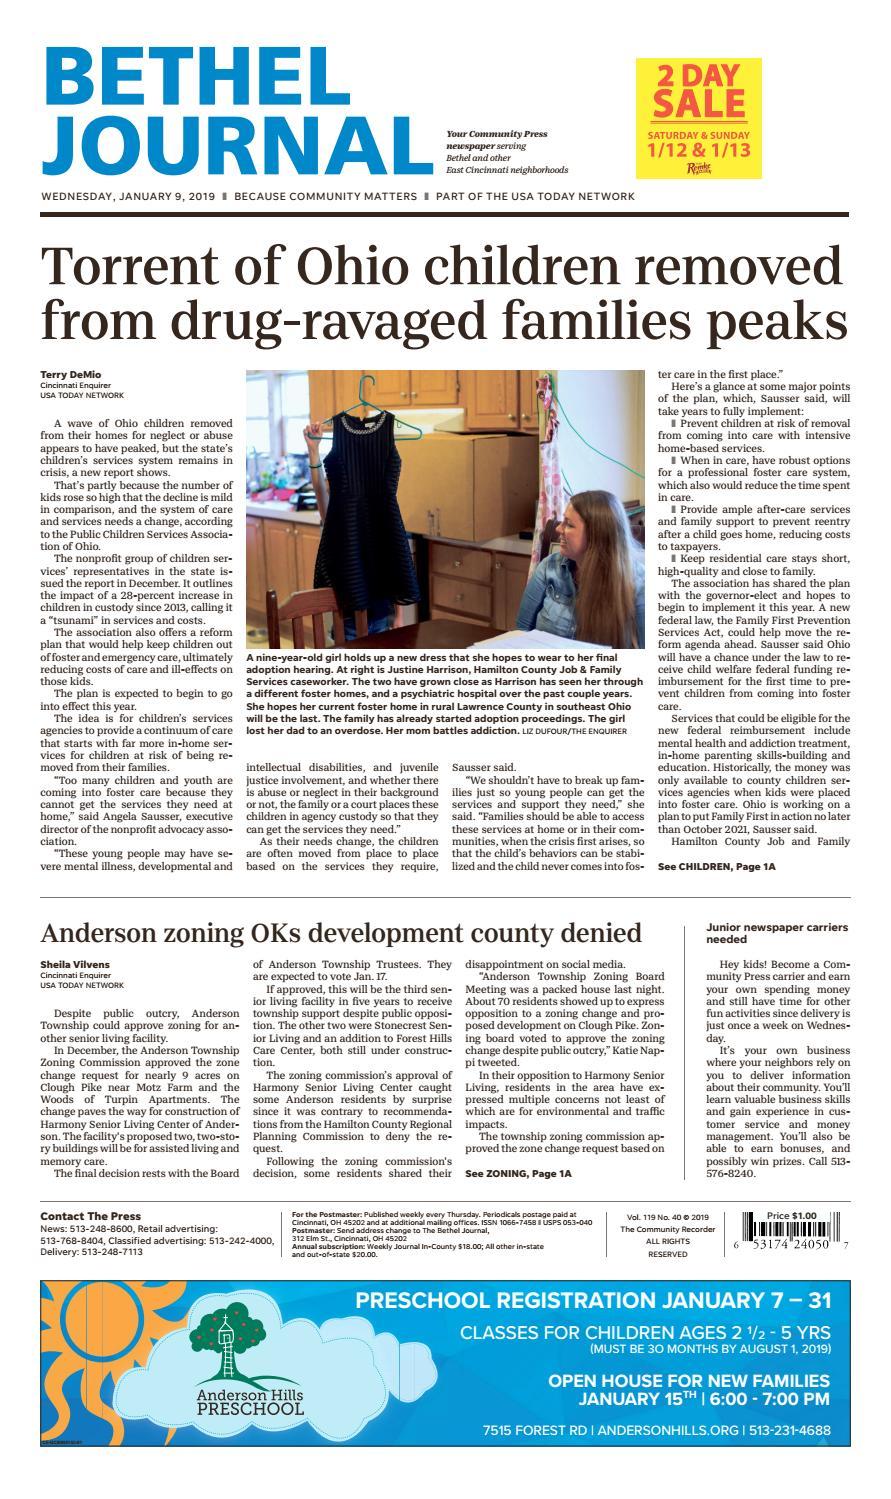 Bethel Journal 01 09 19 by Enquirer Media - issuu 99985e9652131